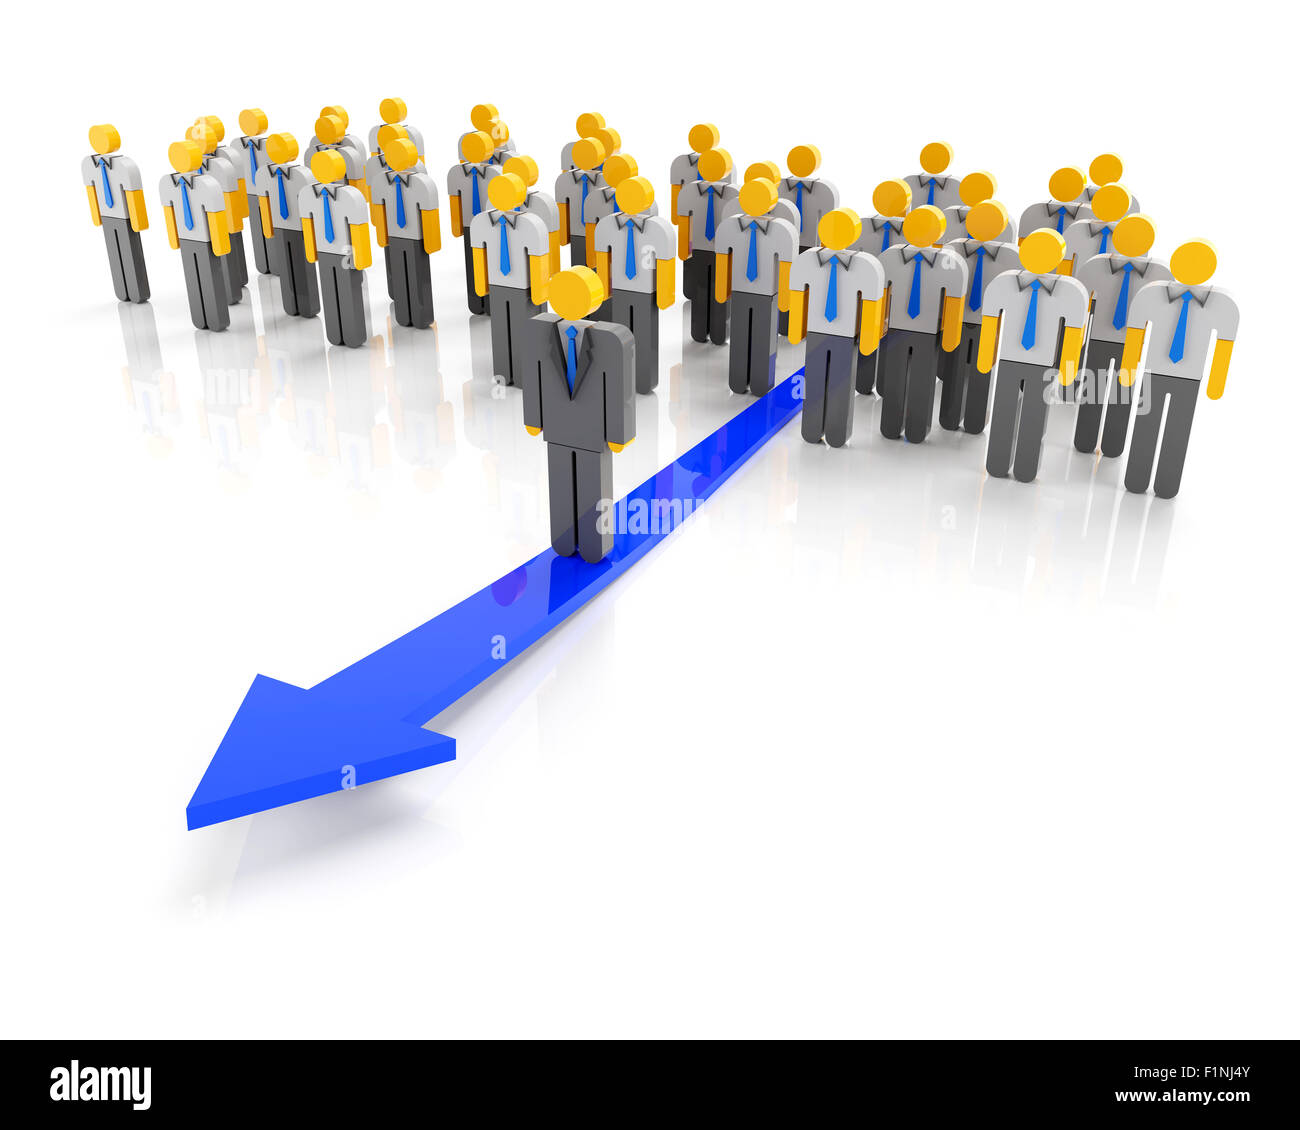 Geschäftsführung und Leitung Stockbild